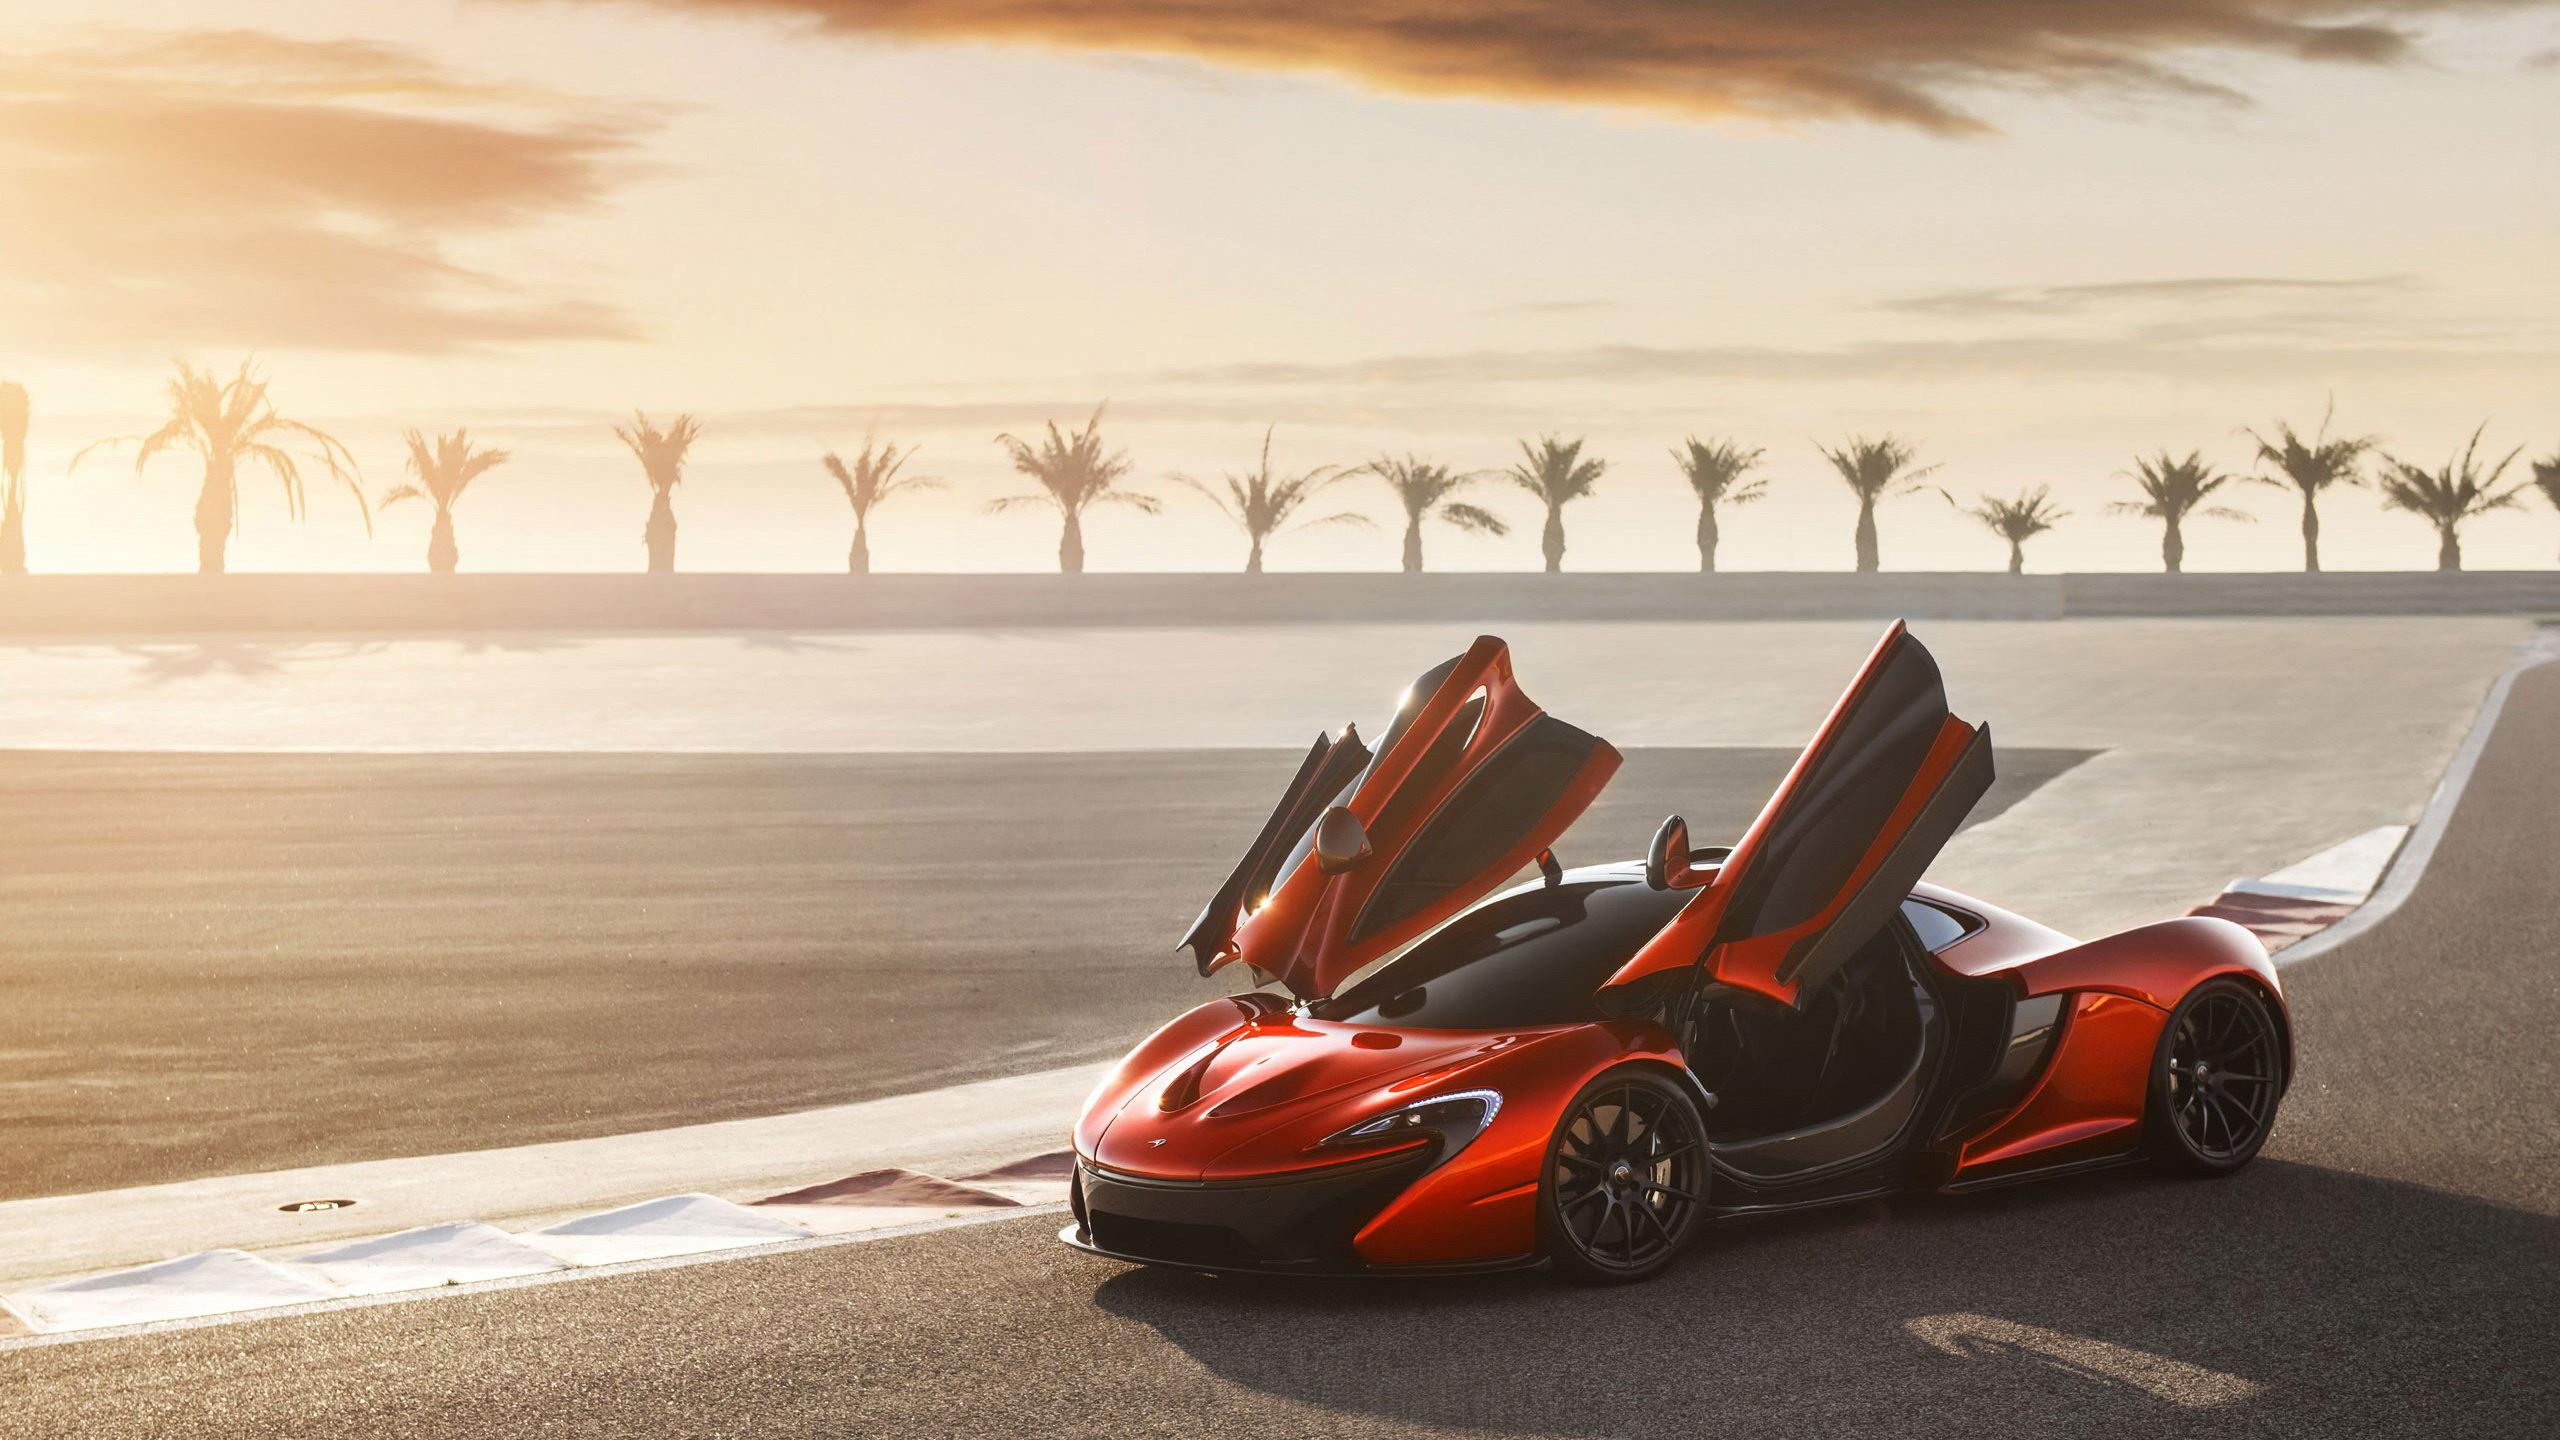 Res: 2560x1440, Mclaren P1 Supercar HD